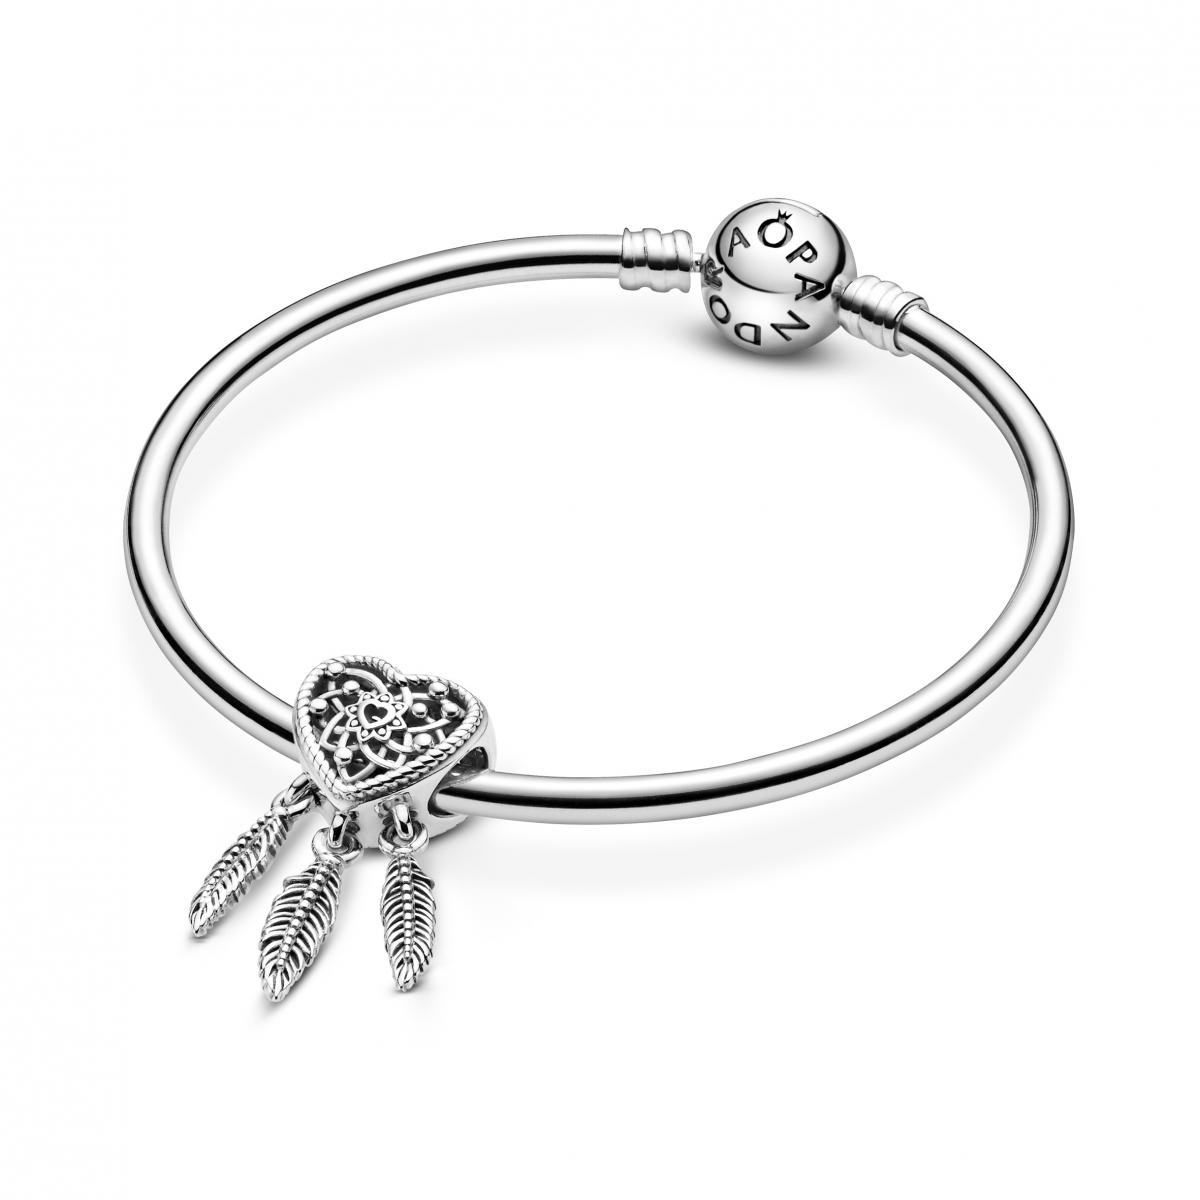 Charms et perles Pandora Bijoux 799107C00 - Pandora Passions ...